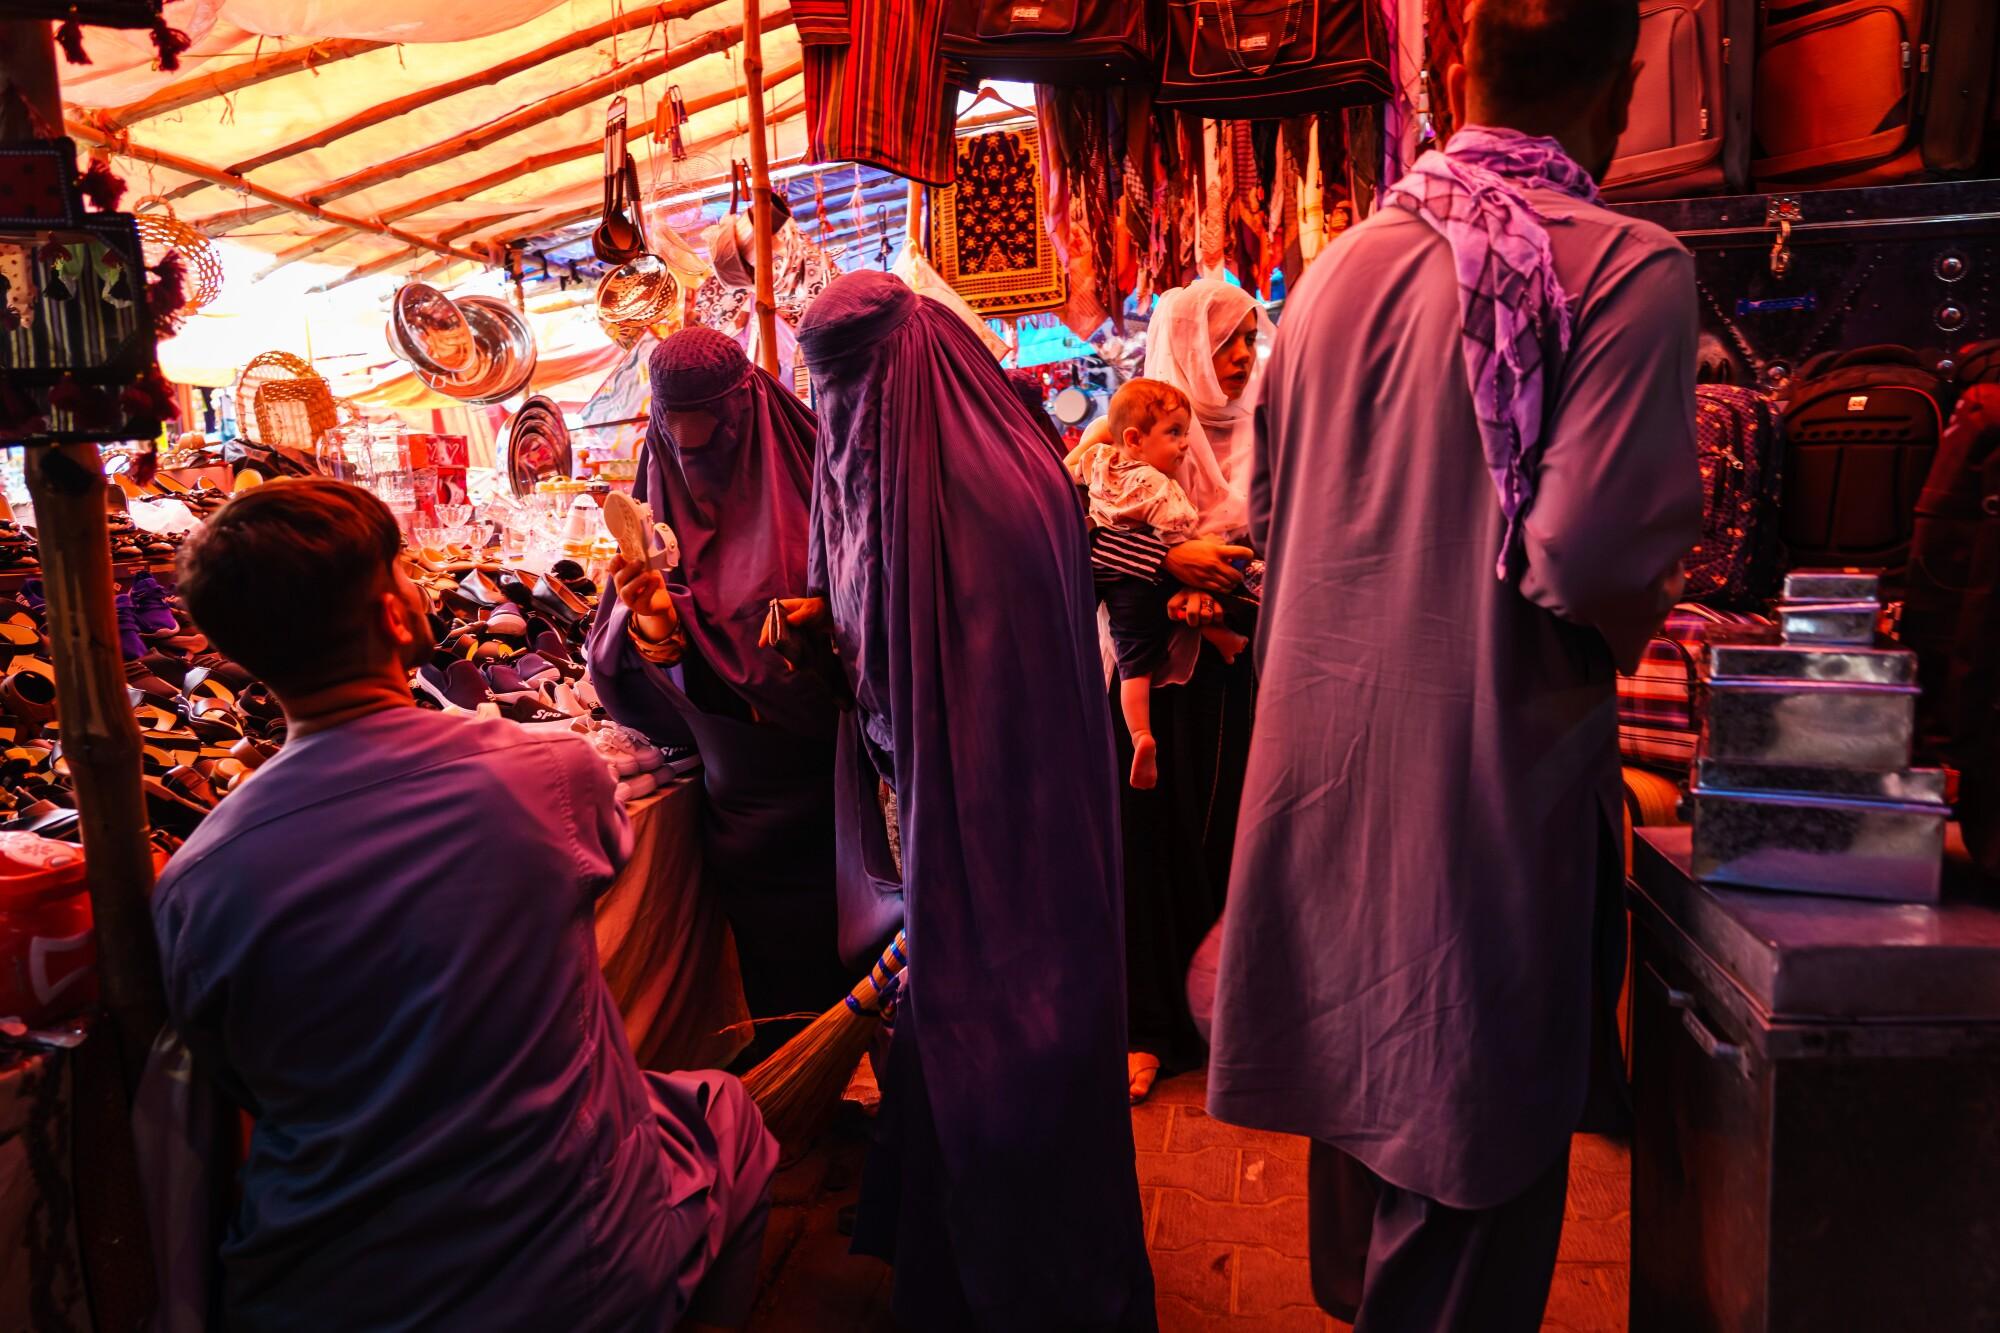 A shop in the women's area of the Lycee Maryam Bazaar in the Khair Khana neighborhood in Kabul, Afghanistan.